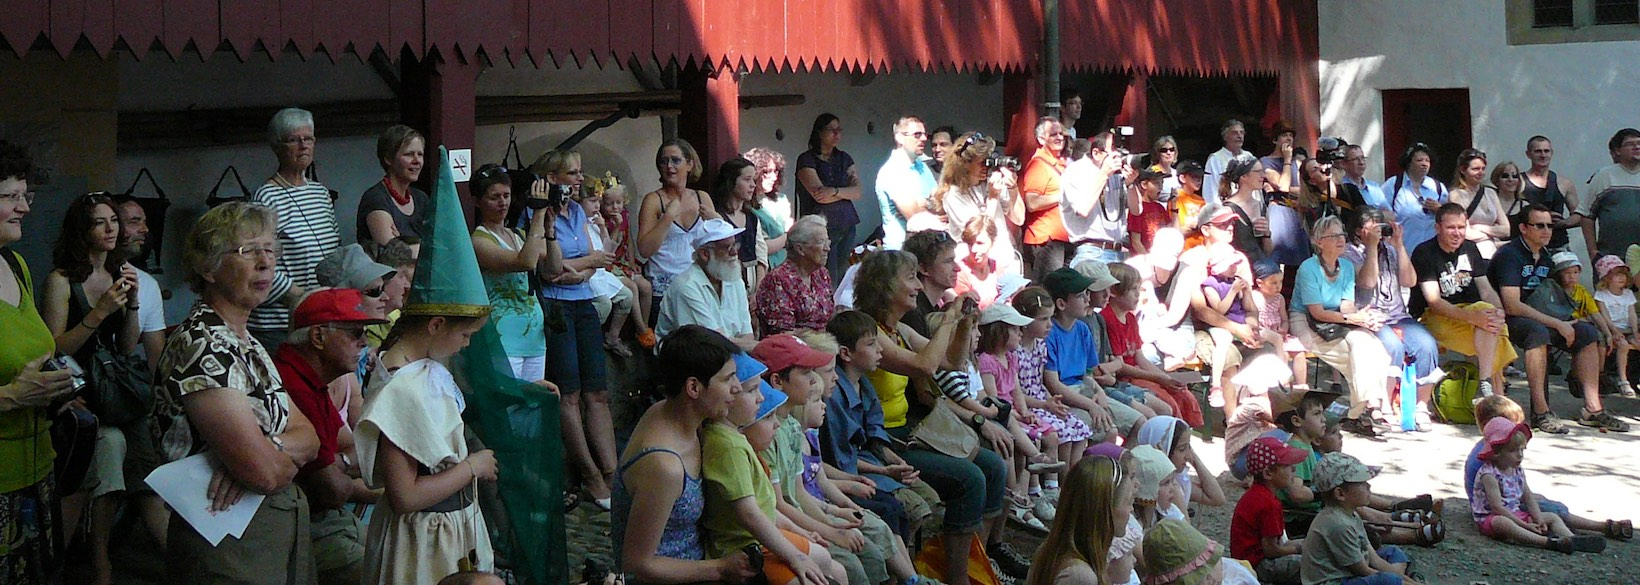 Publikum im Schlosshof